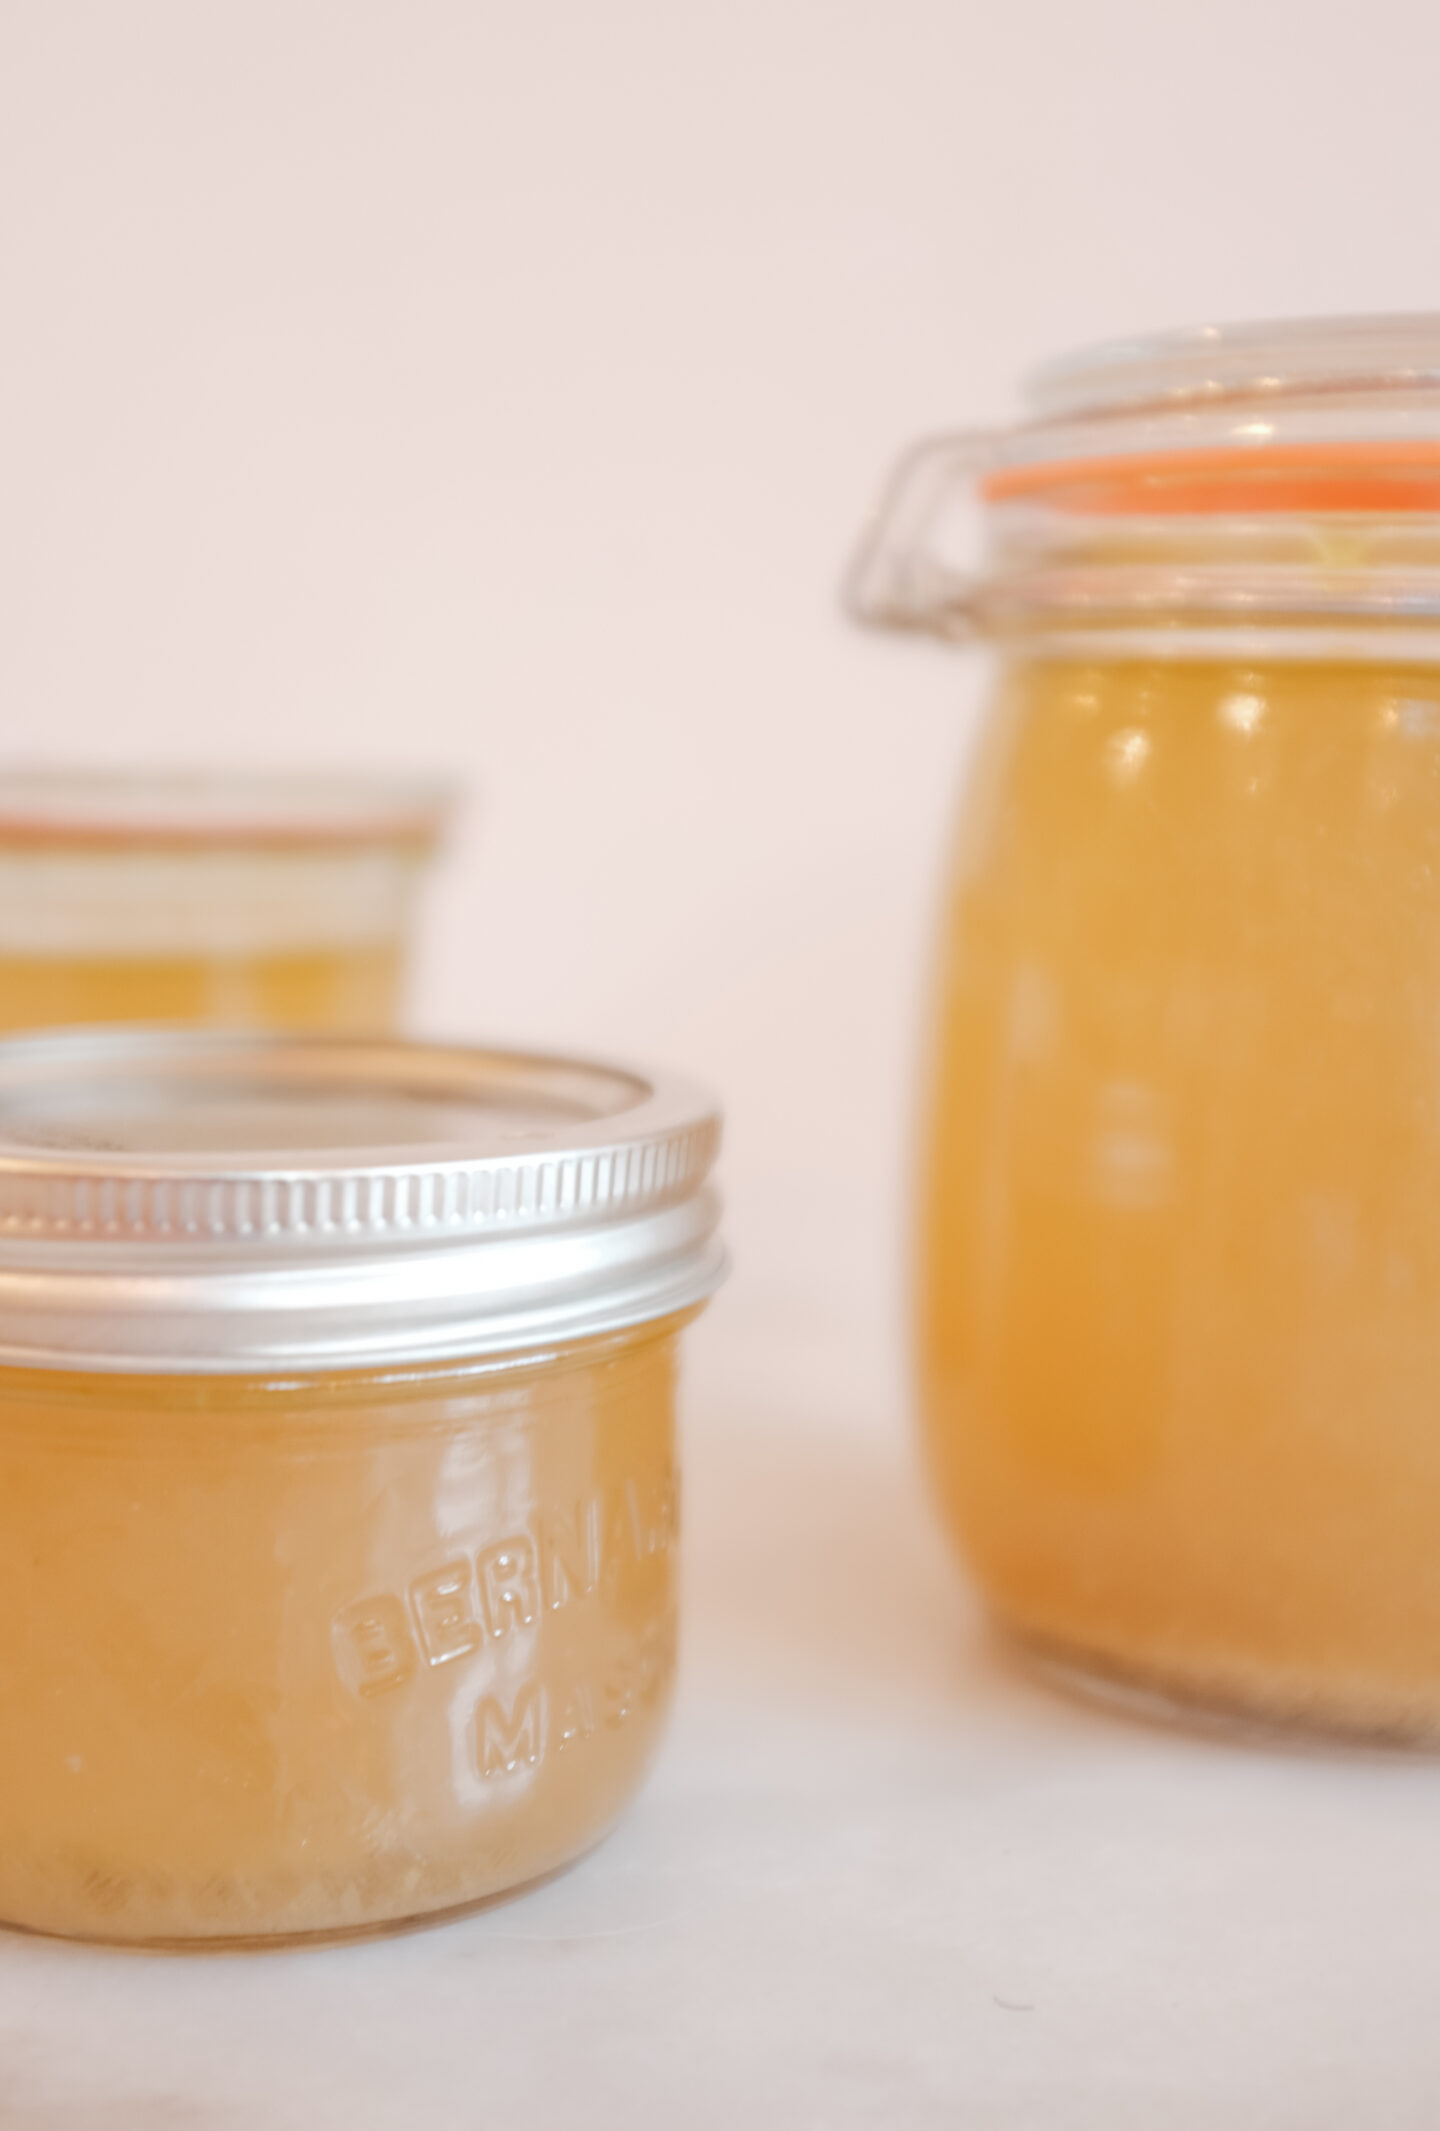 Bone Broth Homemade Recipe